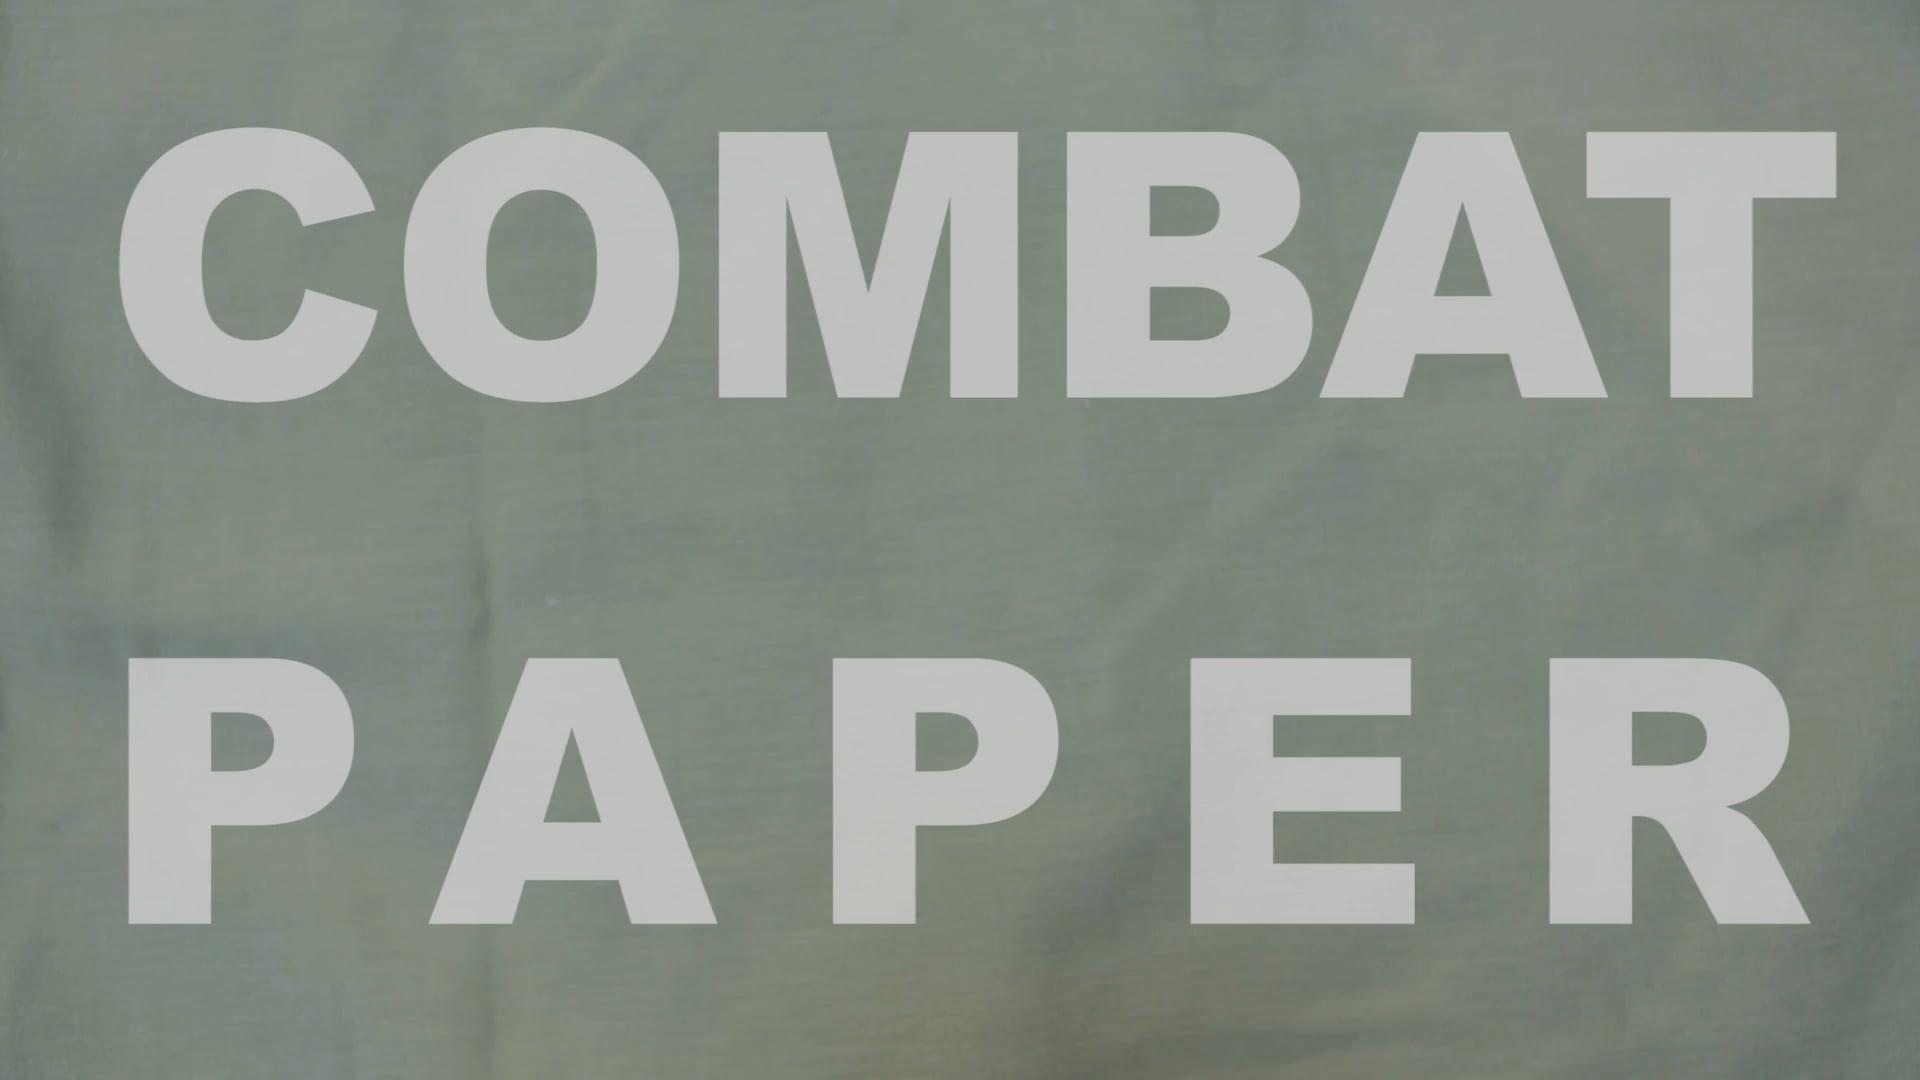 Make Combat Paper